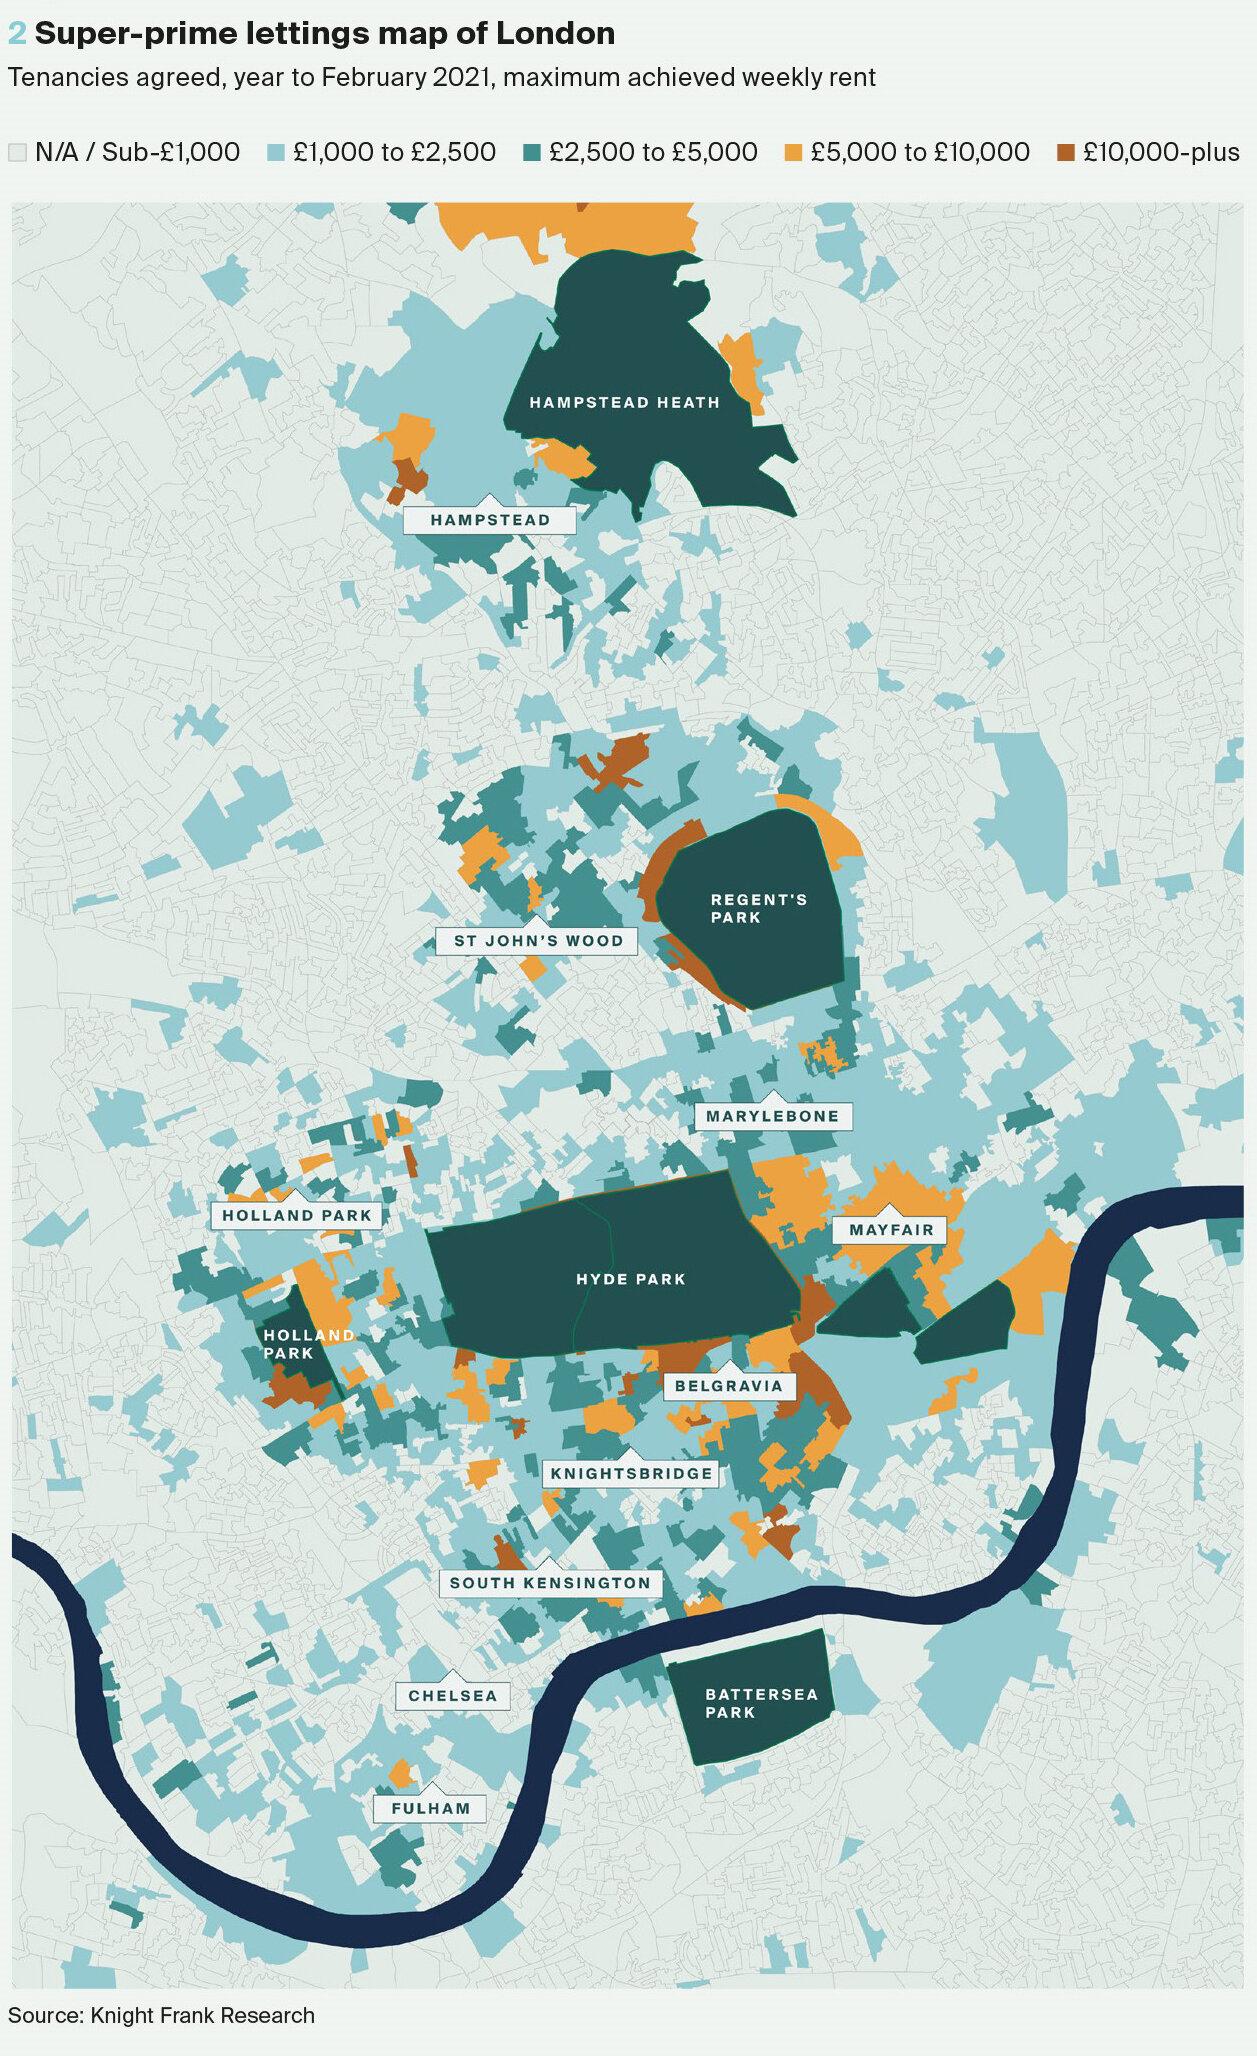 https://www.worldpropertyjournal.com/news-assets/Super-prime-lettings-map-of-London.jpg